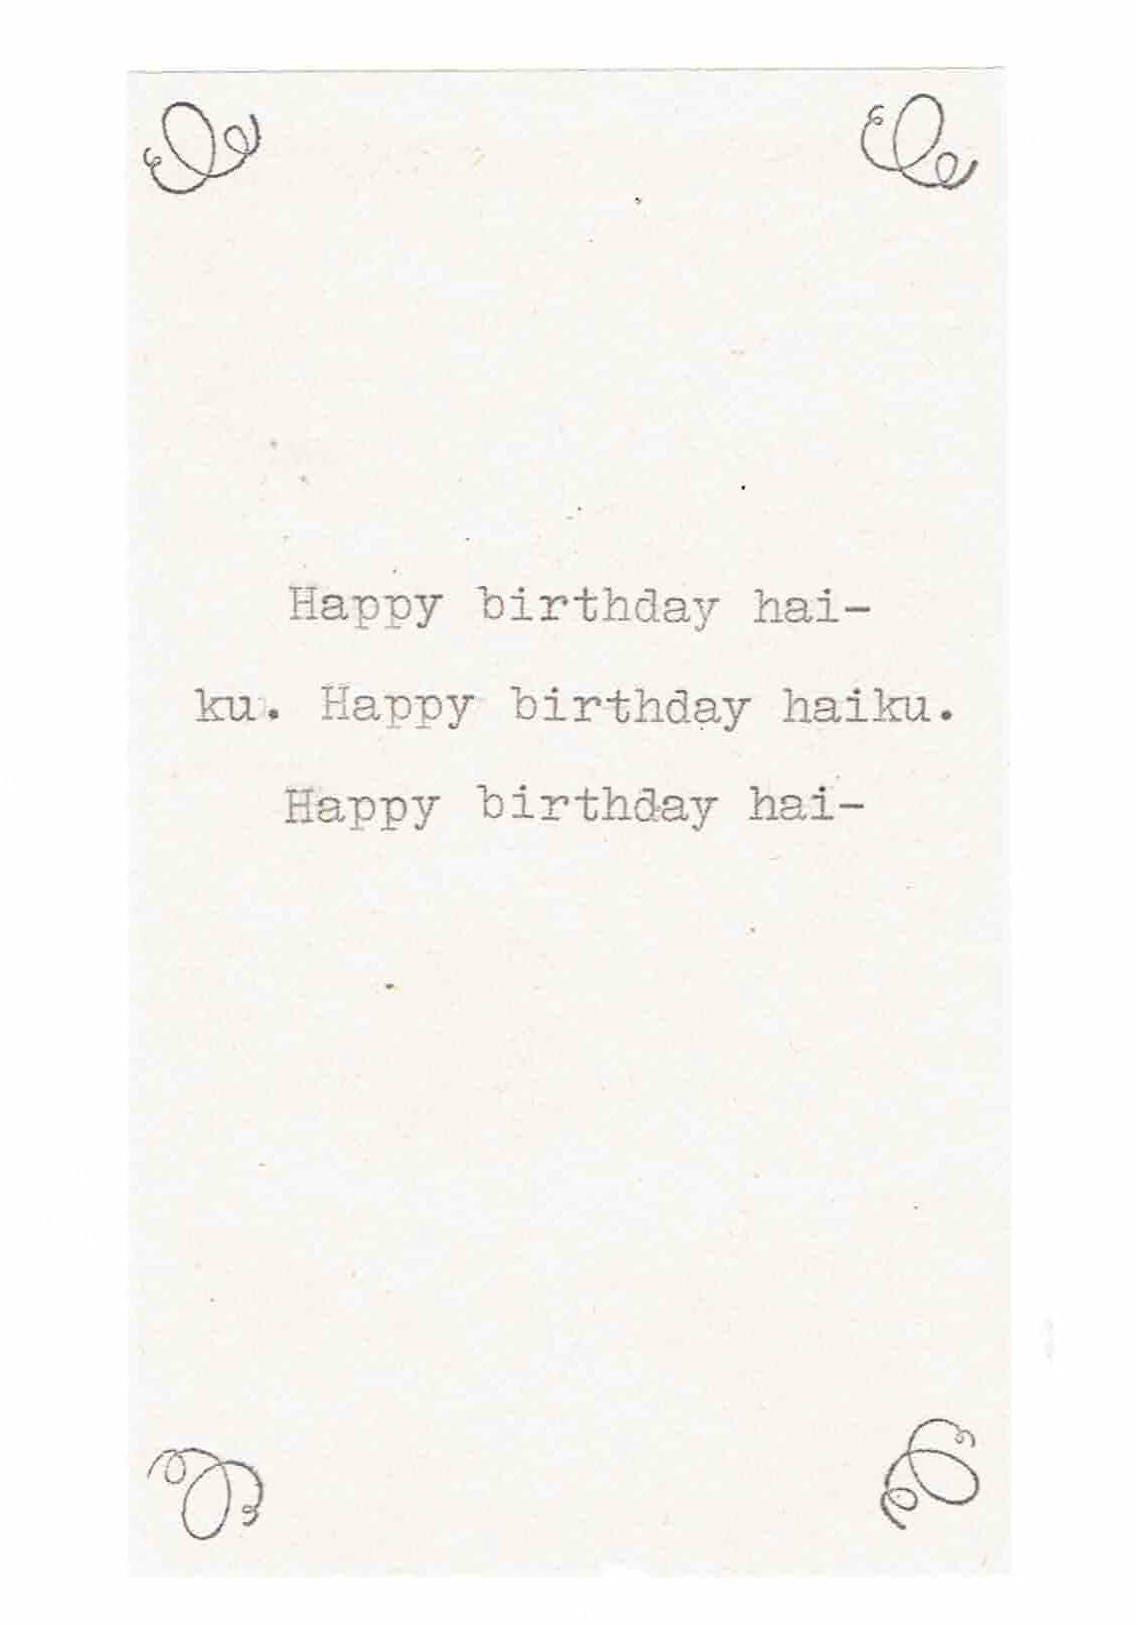 birthday haiku Happy Birthday Haiku Card Funny Birthday Card Poetry Writer | Etsy birthday haiku